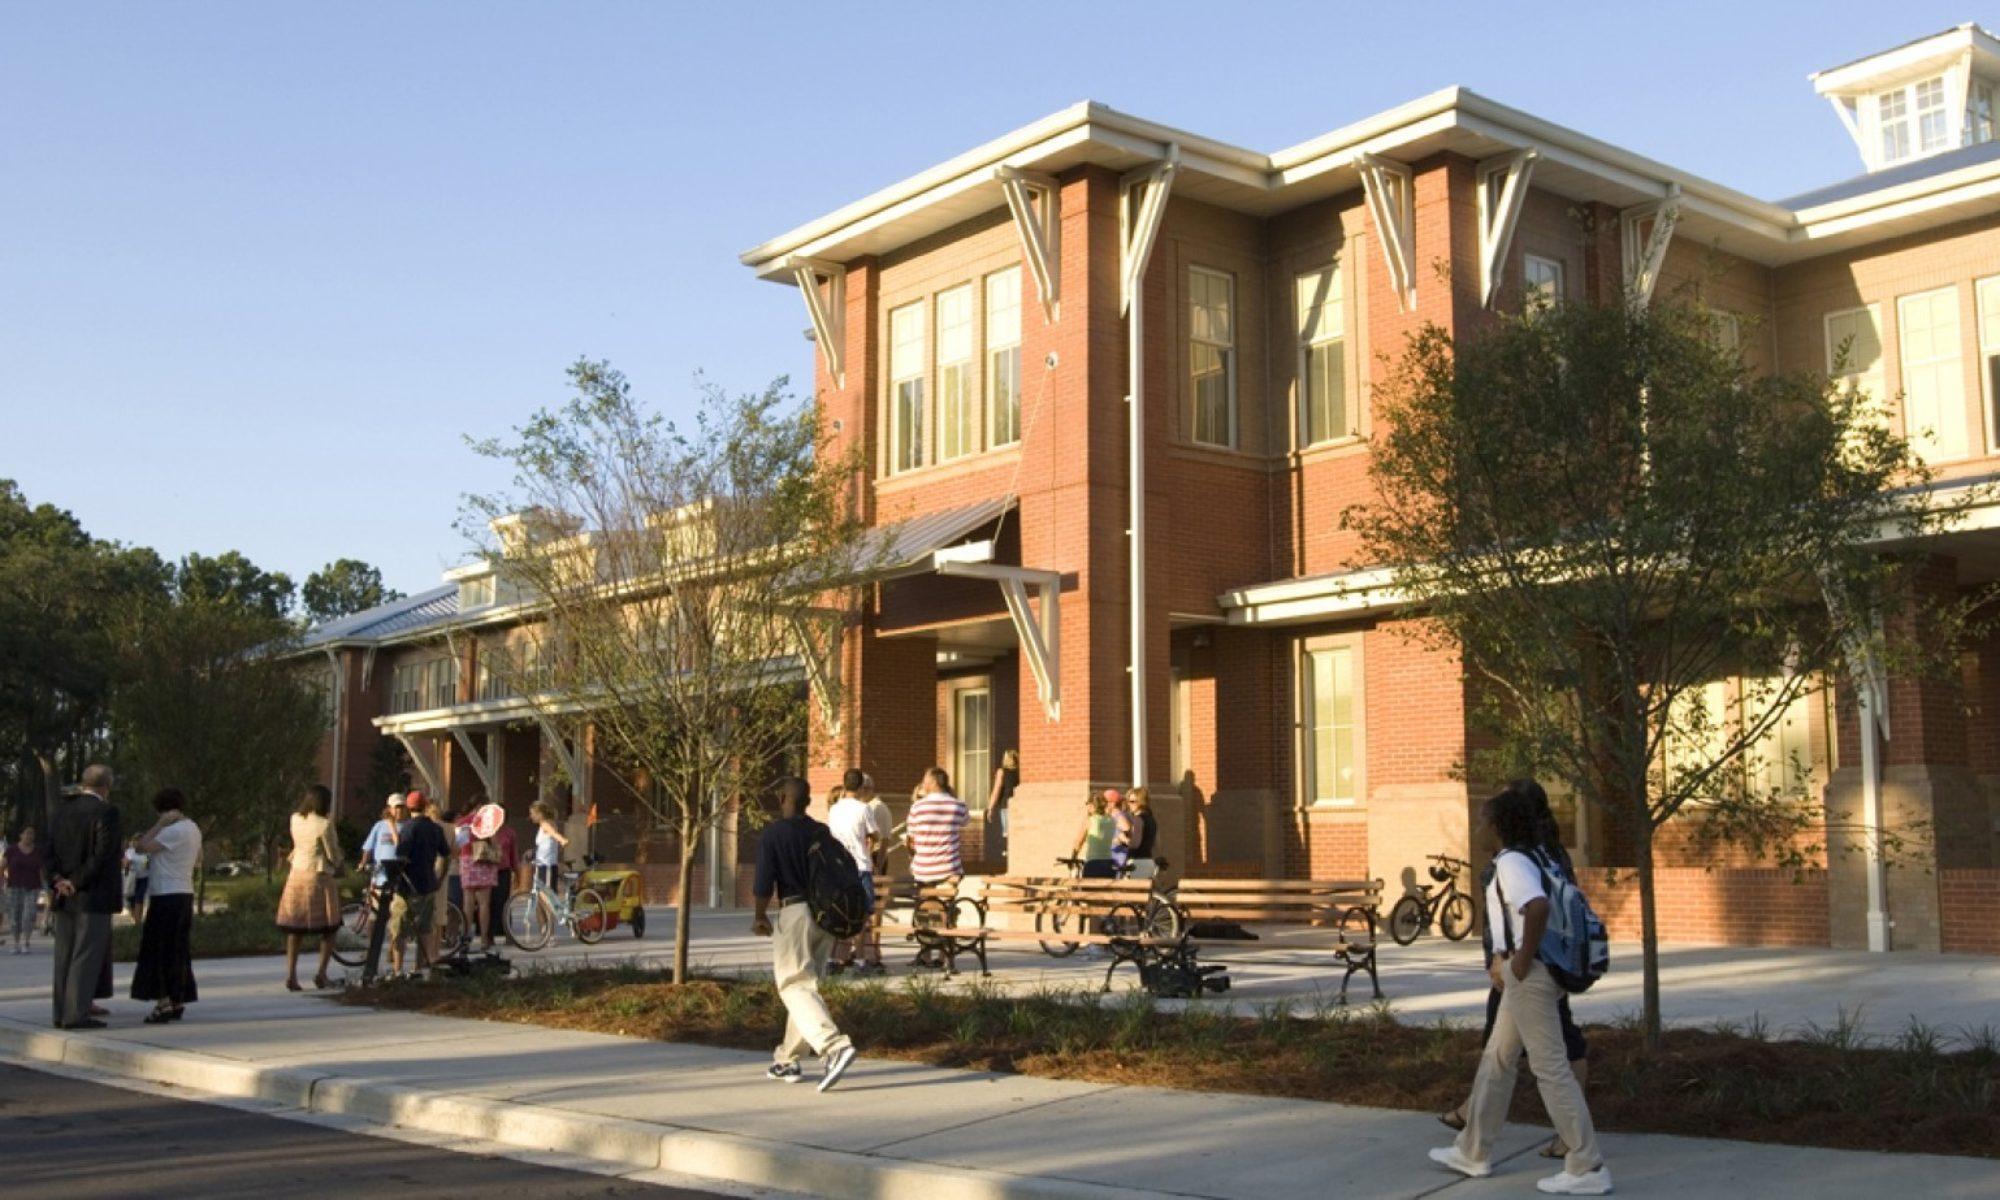 Daniel Island School PTA